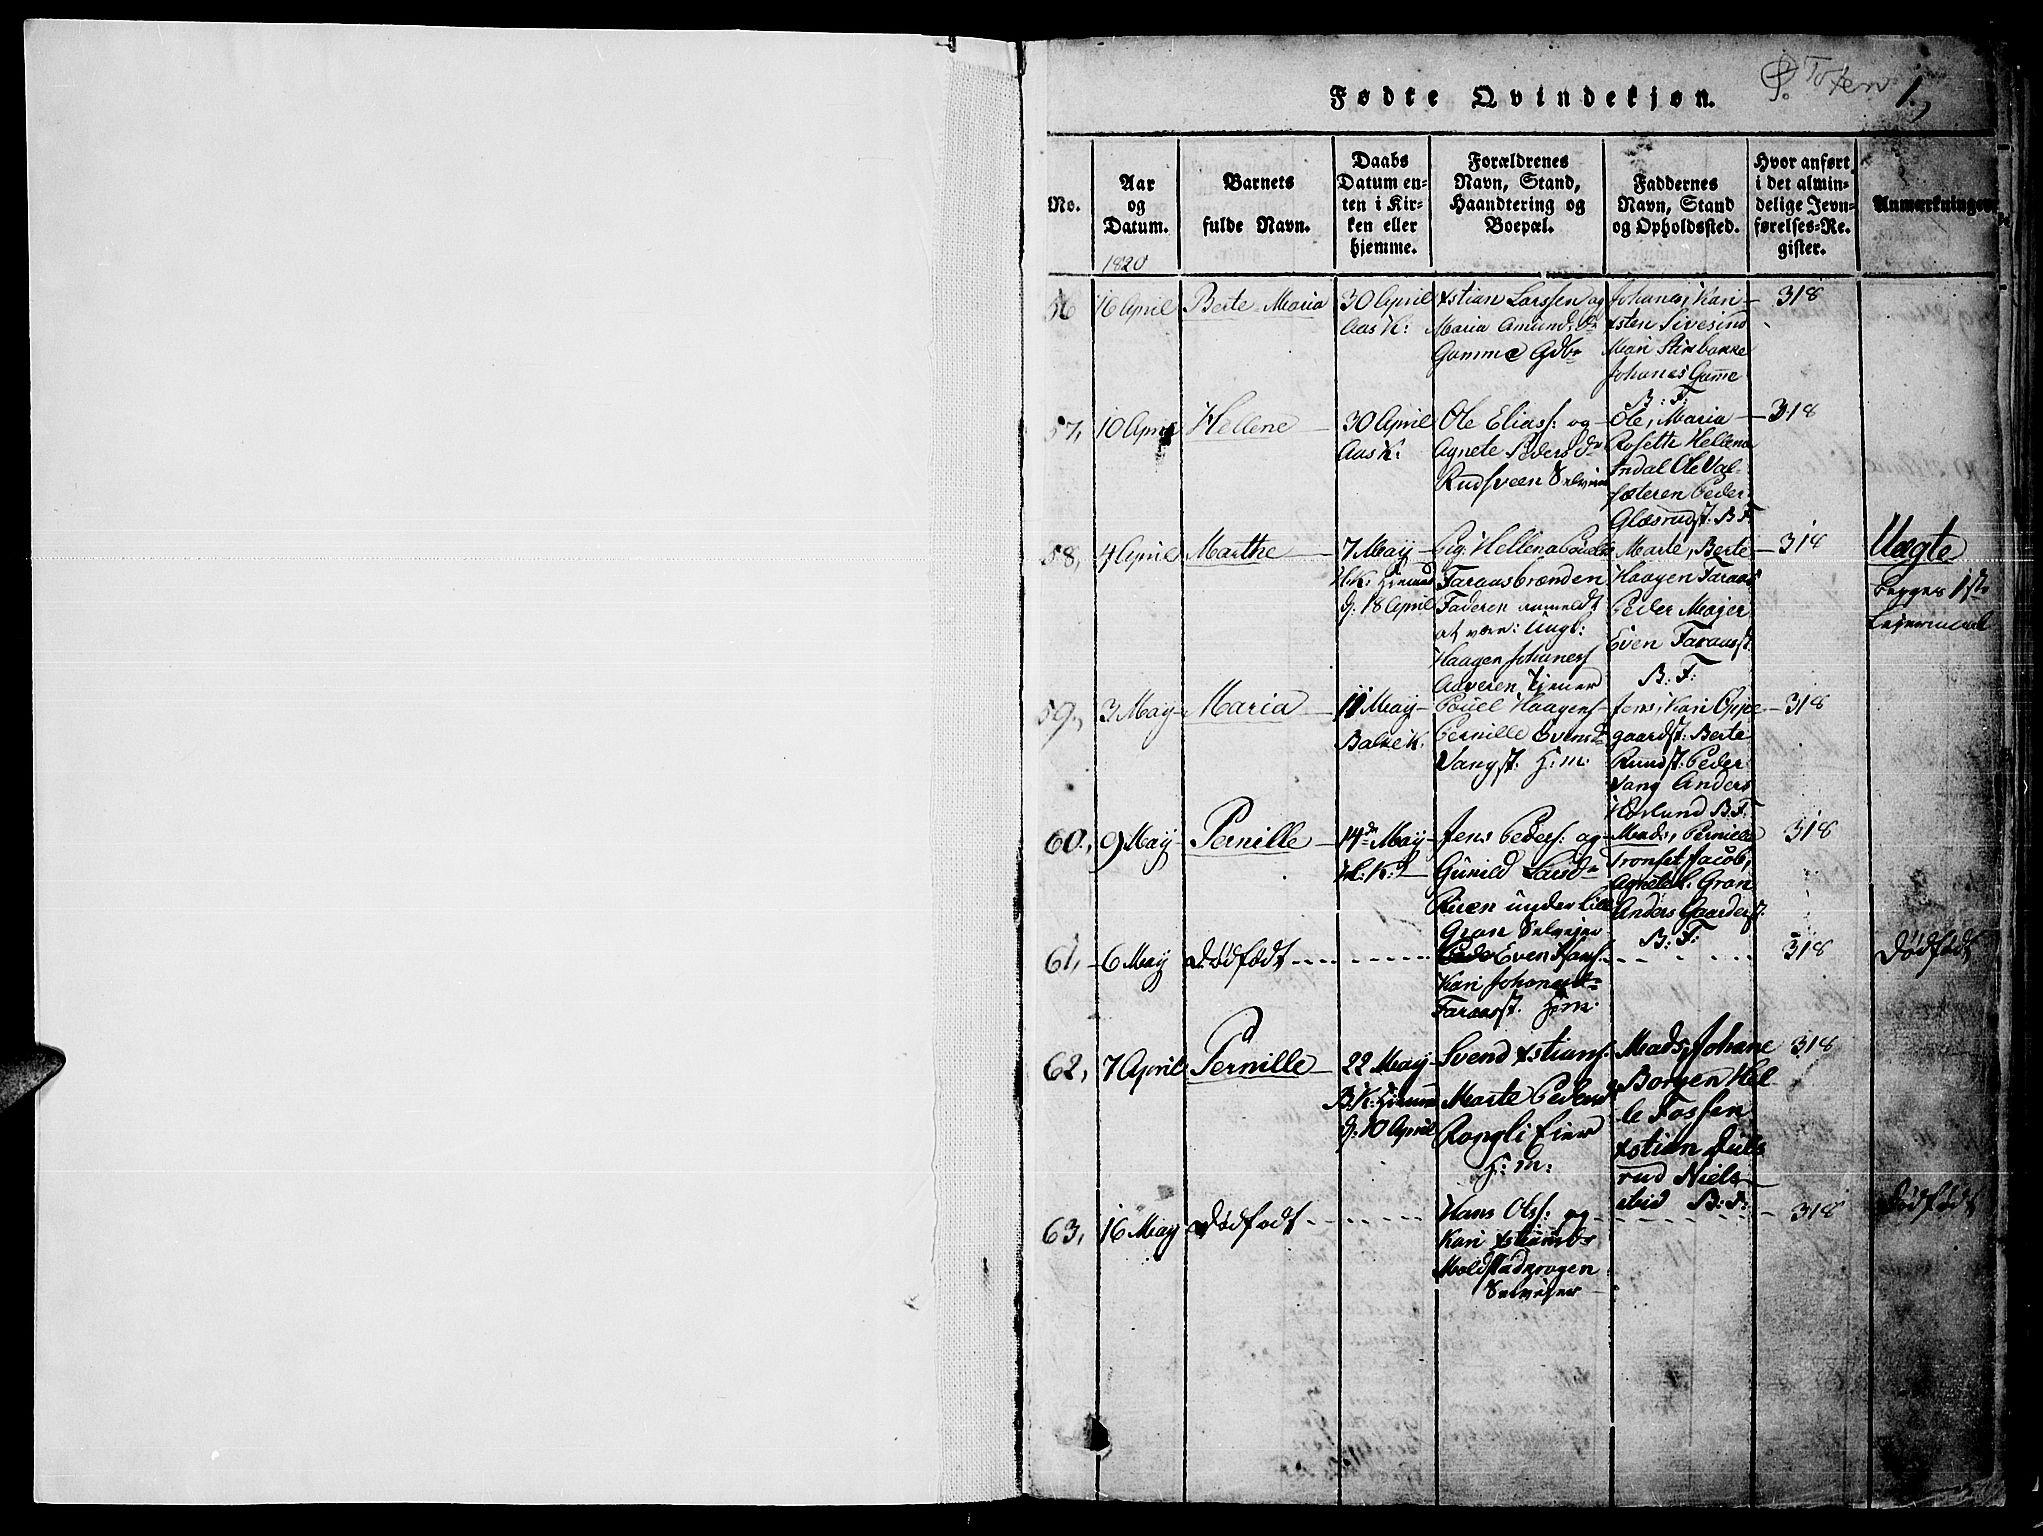 SAH, Toten prestekontor, Ministerialbok nr. 10, 1820-1828, s. 1